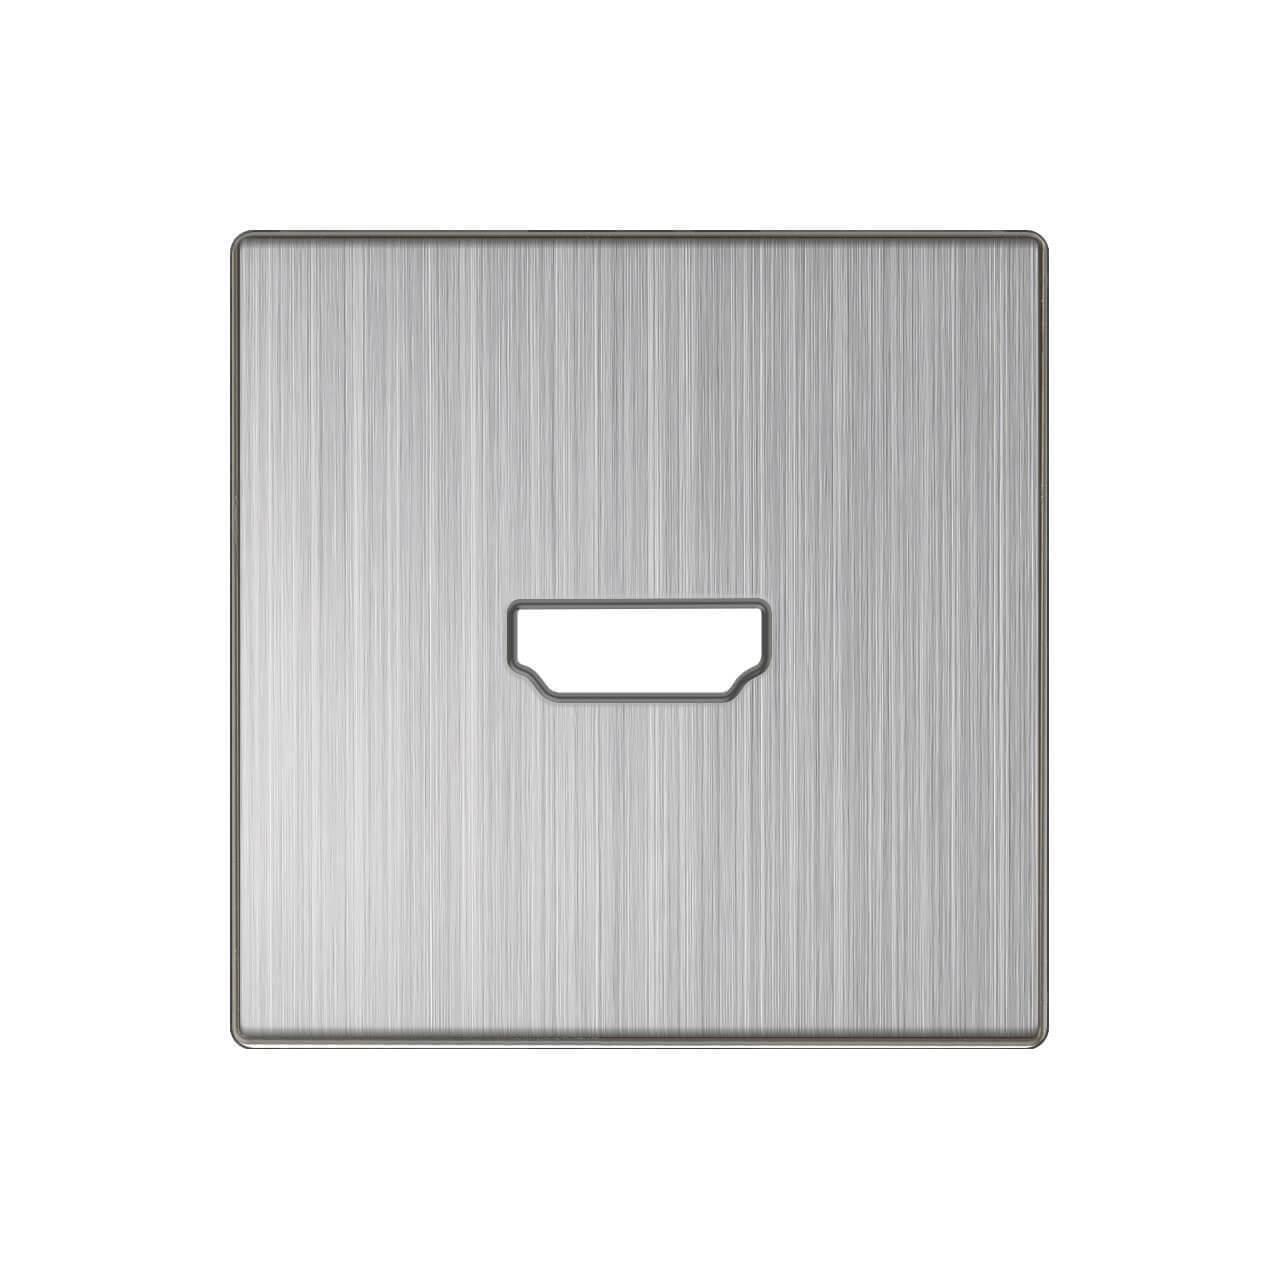 Накладка Werkel для розетки HDMI глянцевый никель WL02-HDMI-CP 4690389119569